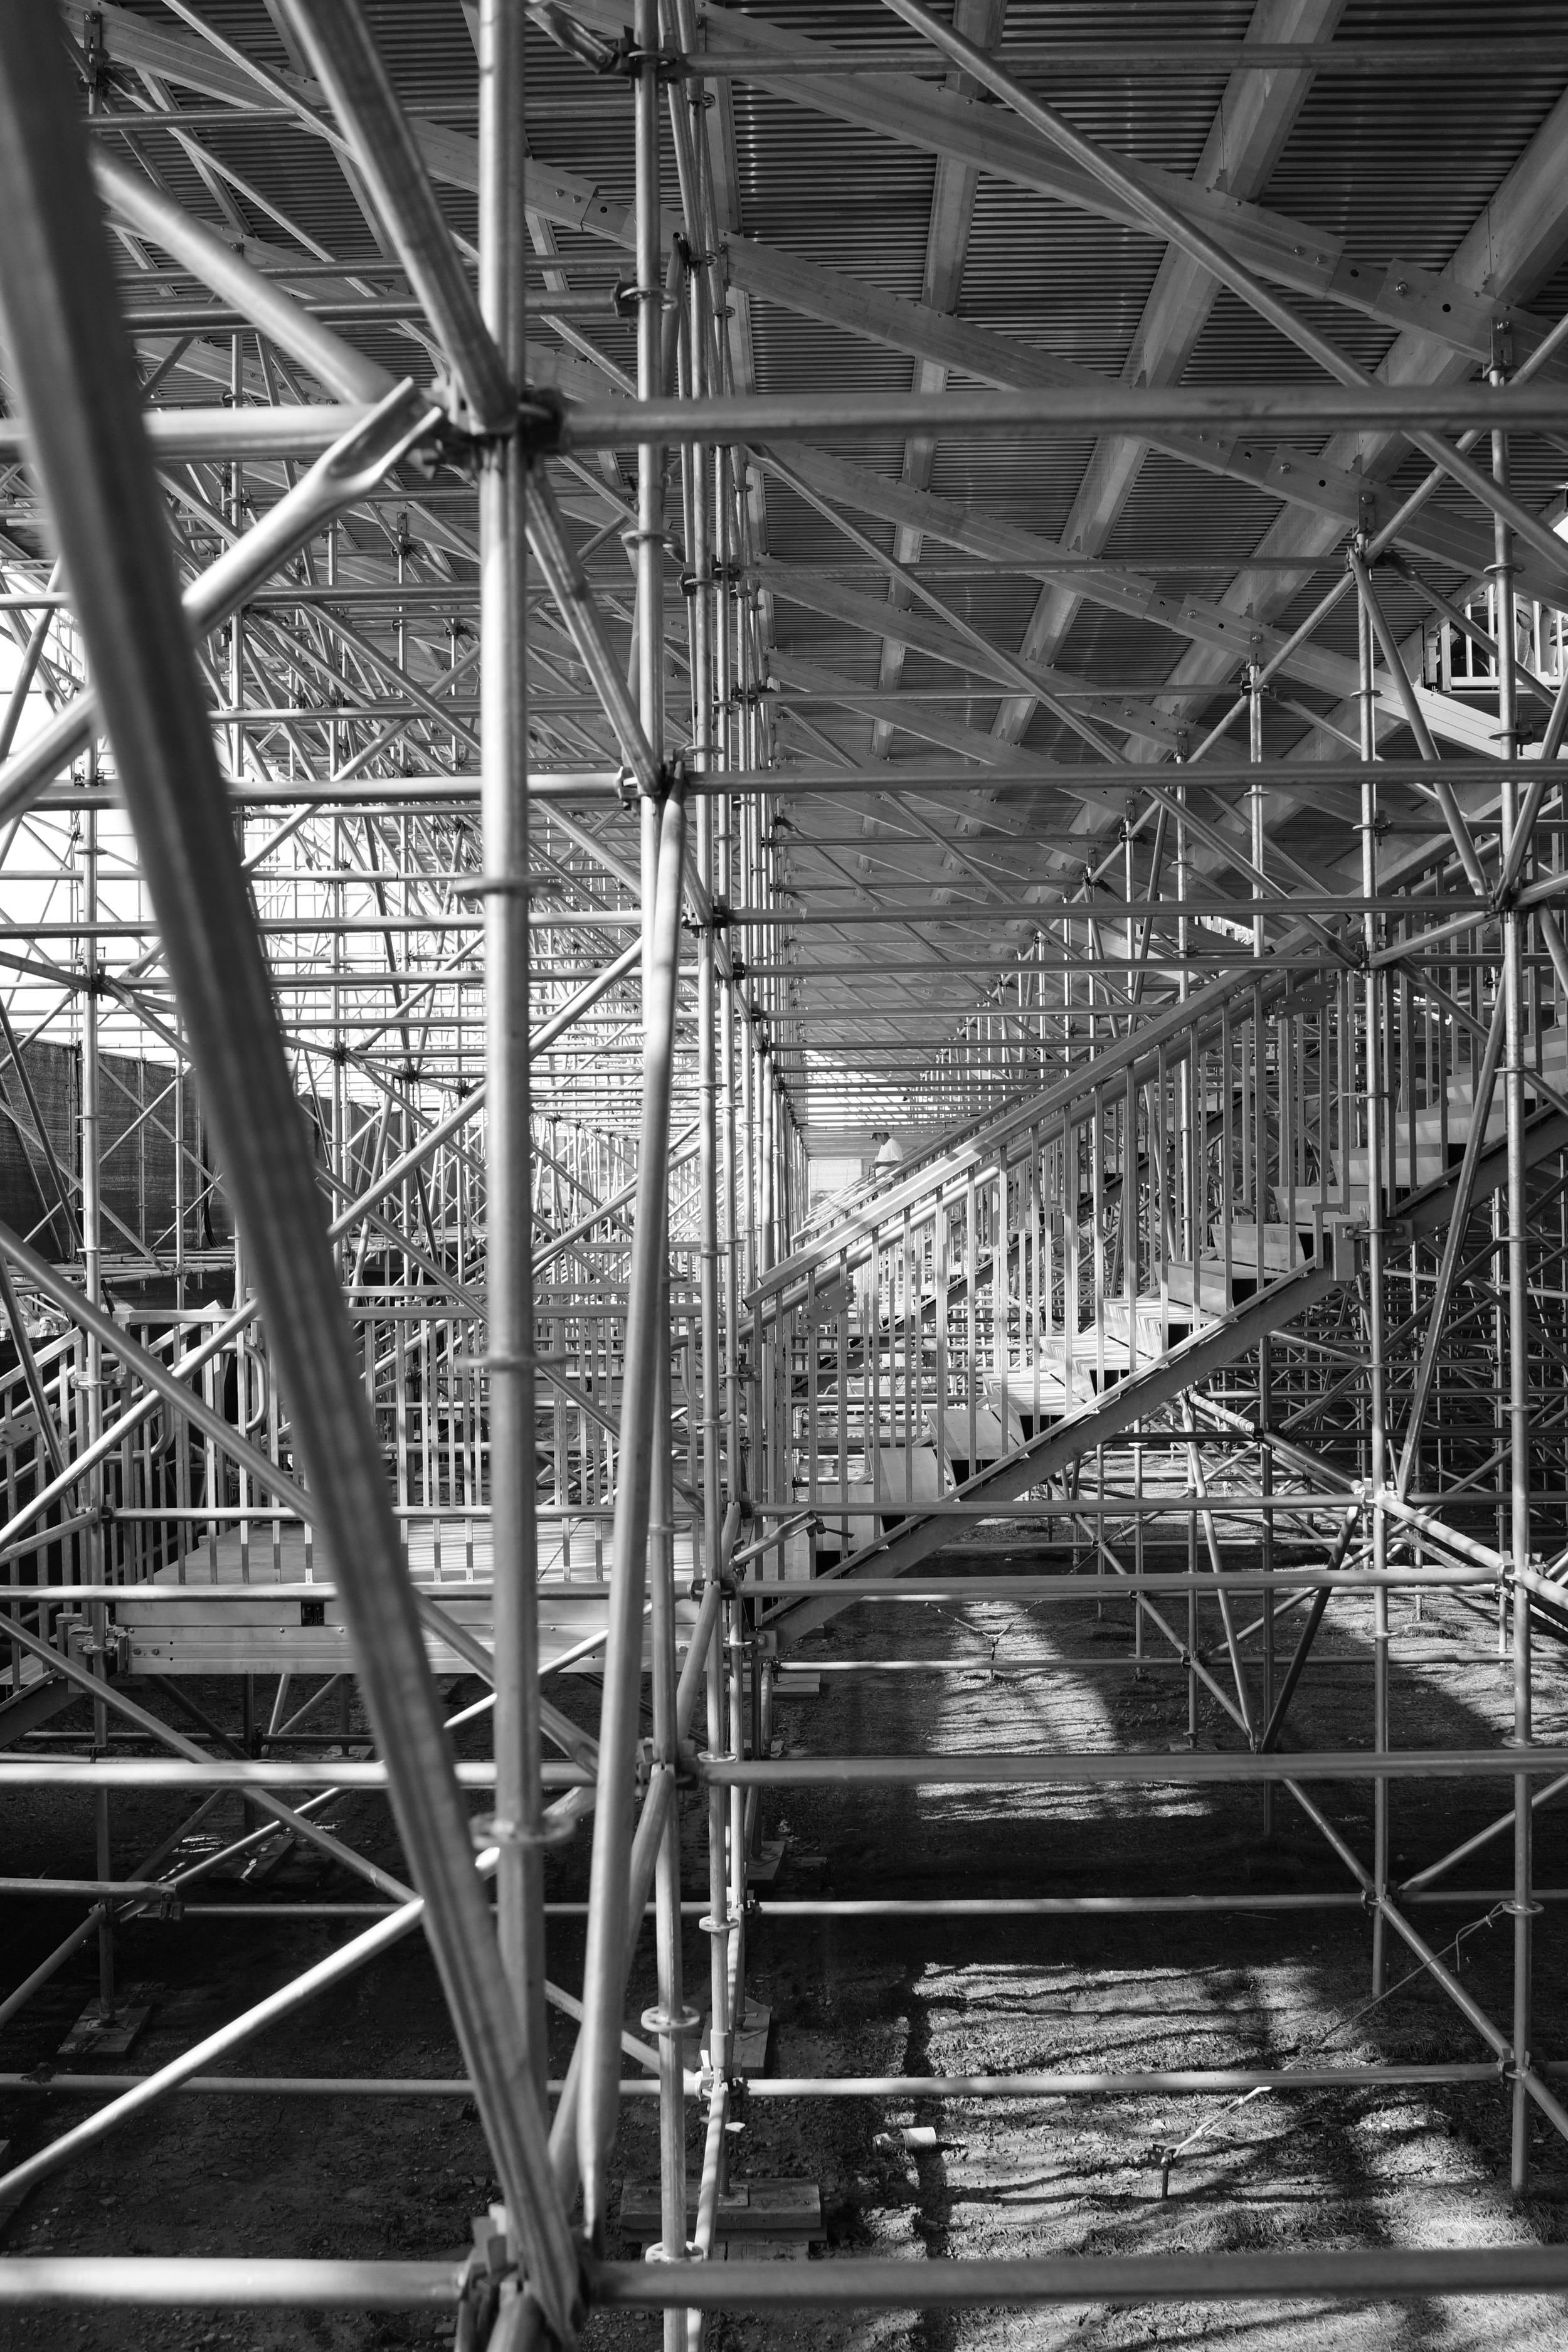 Scaffolding for turn 15 grandstands